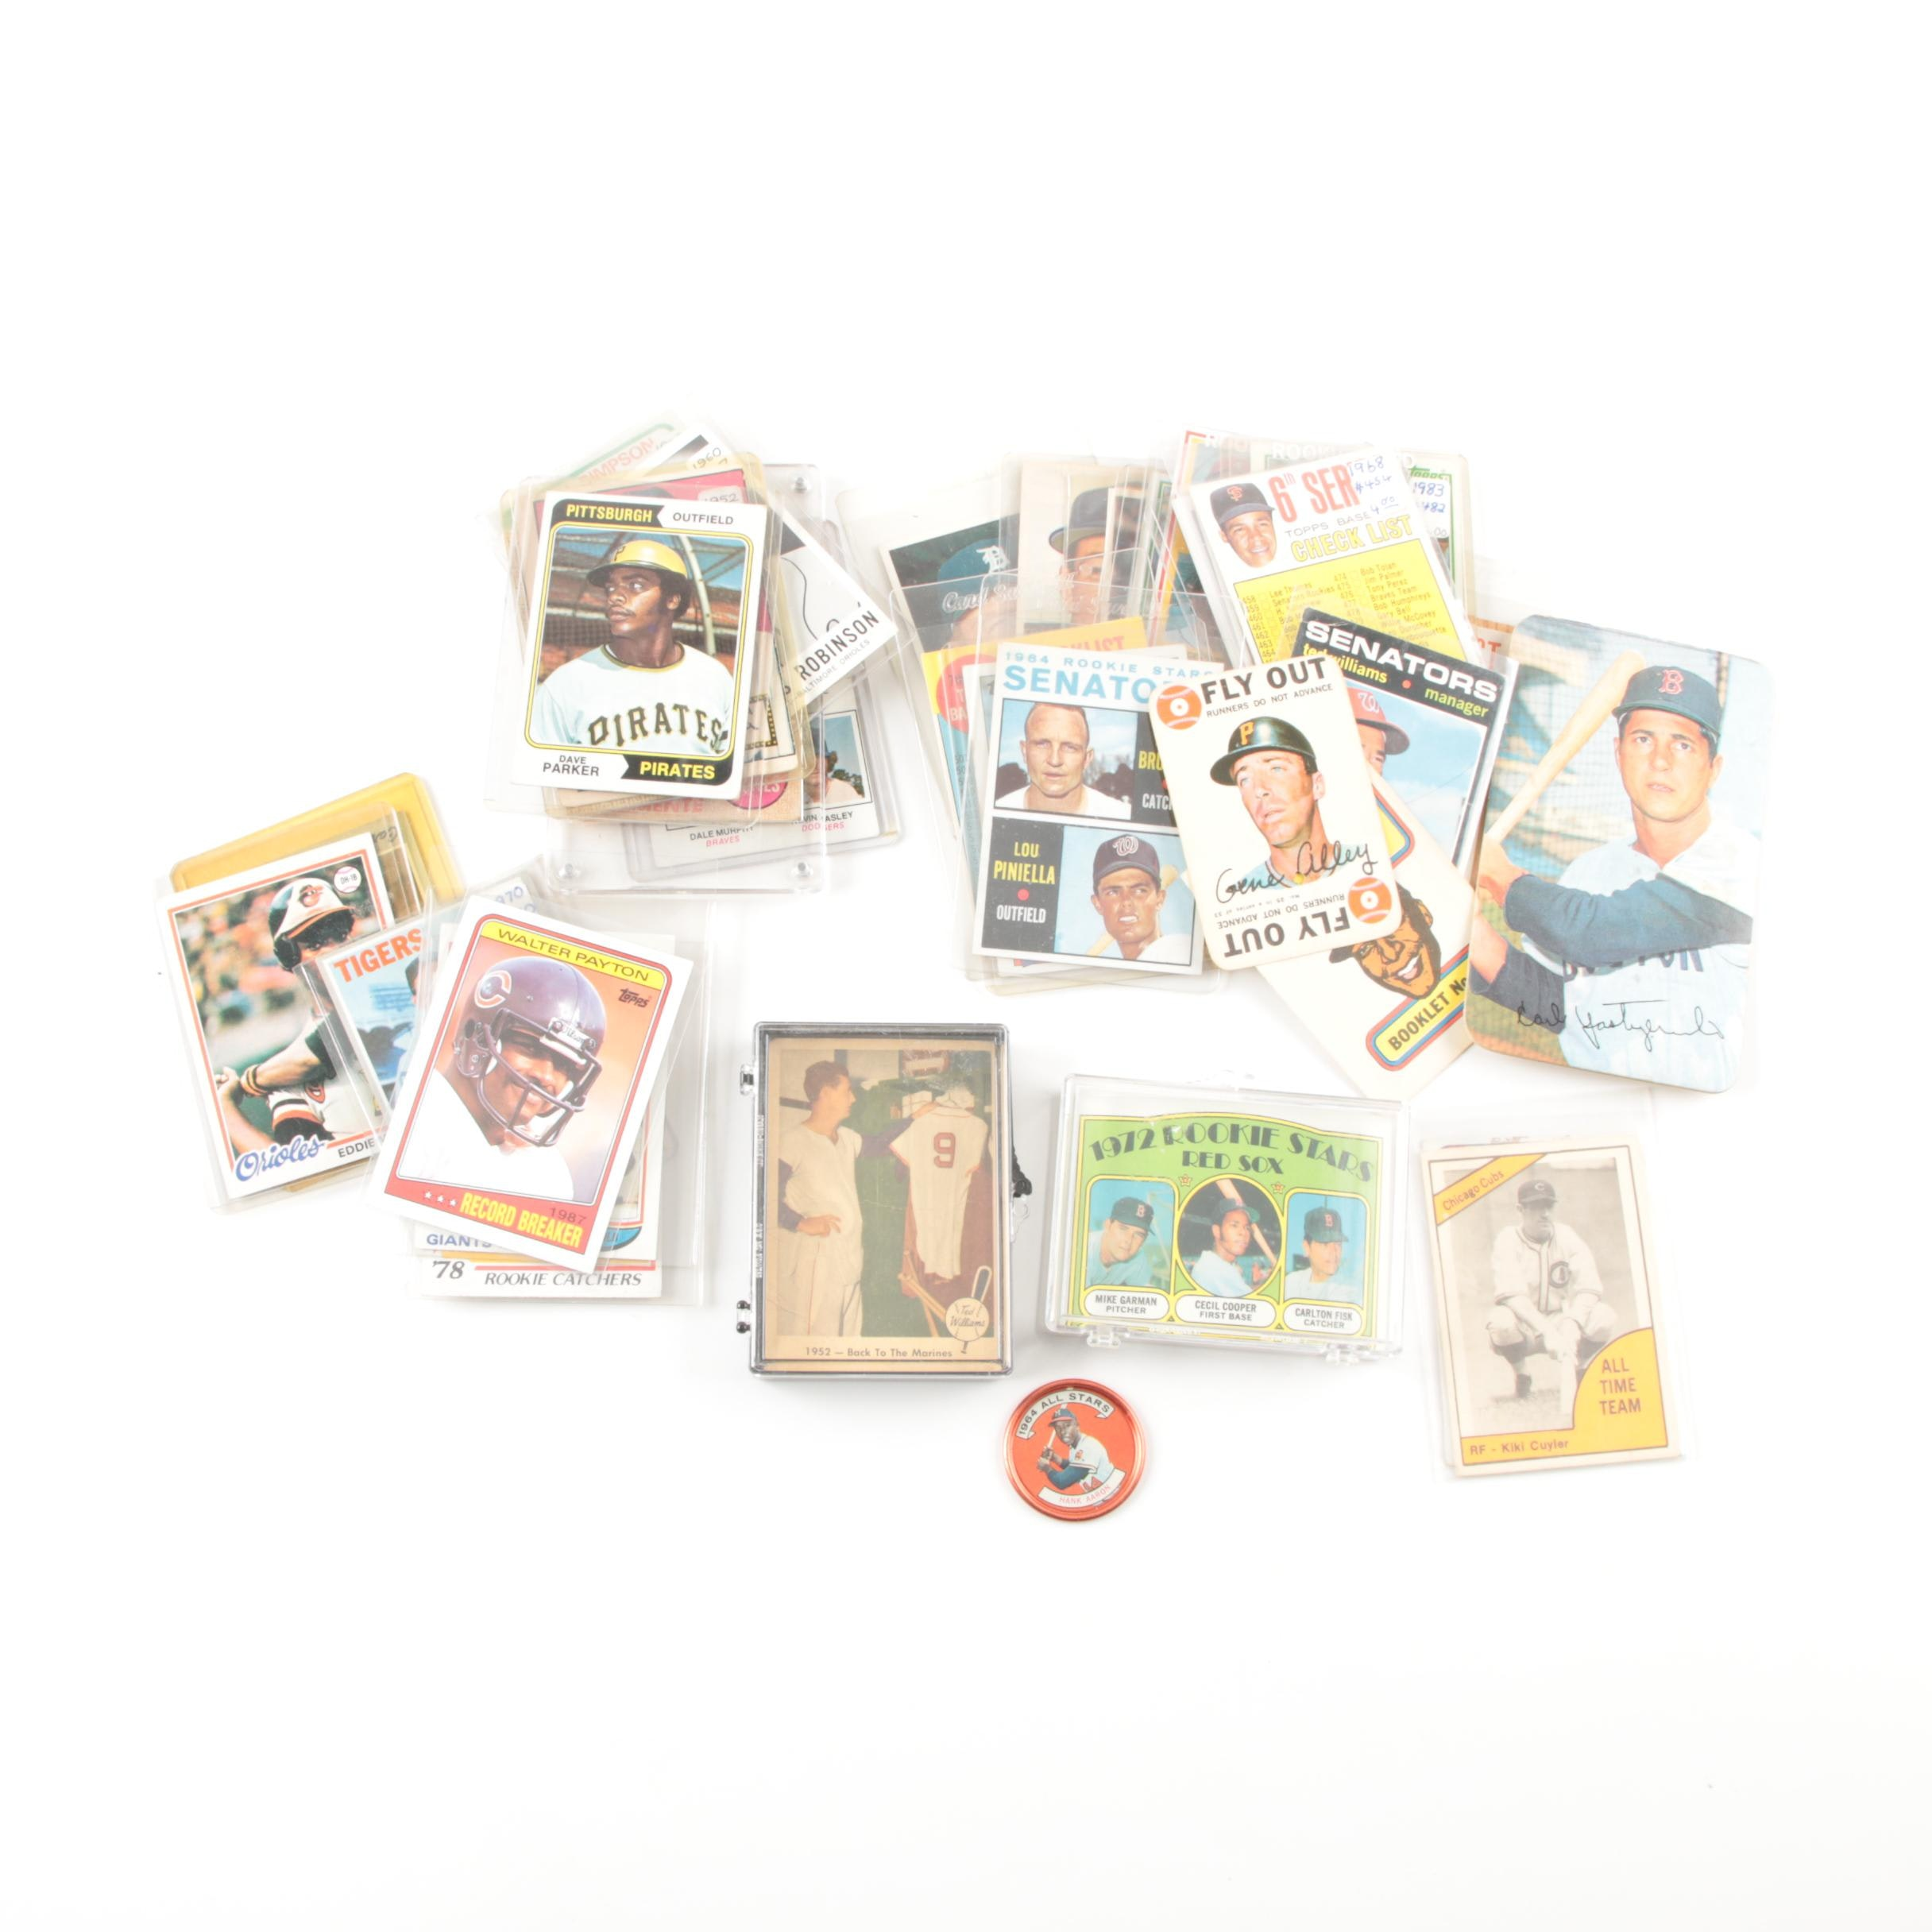 Baseball and Football Trading Cards Including Walter Payton